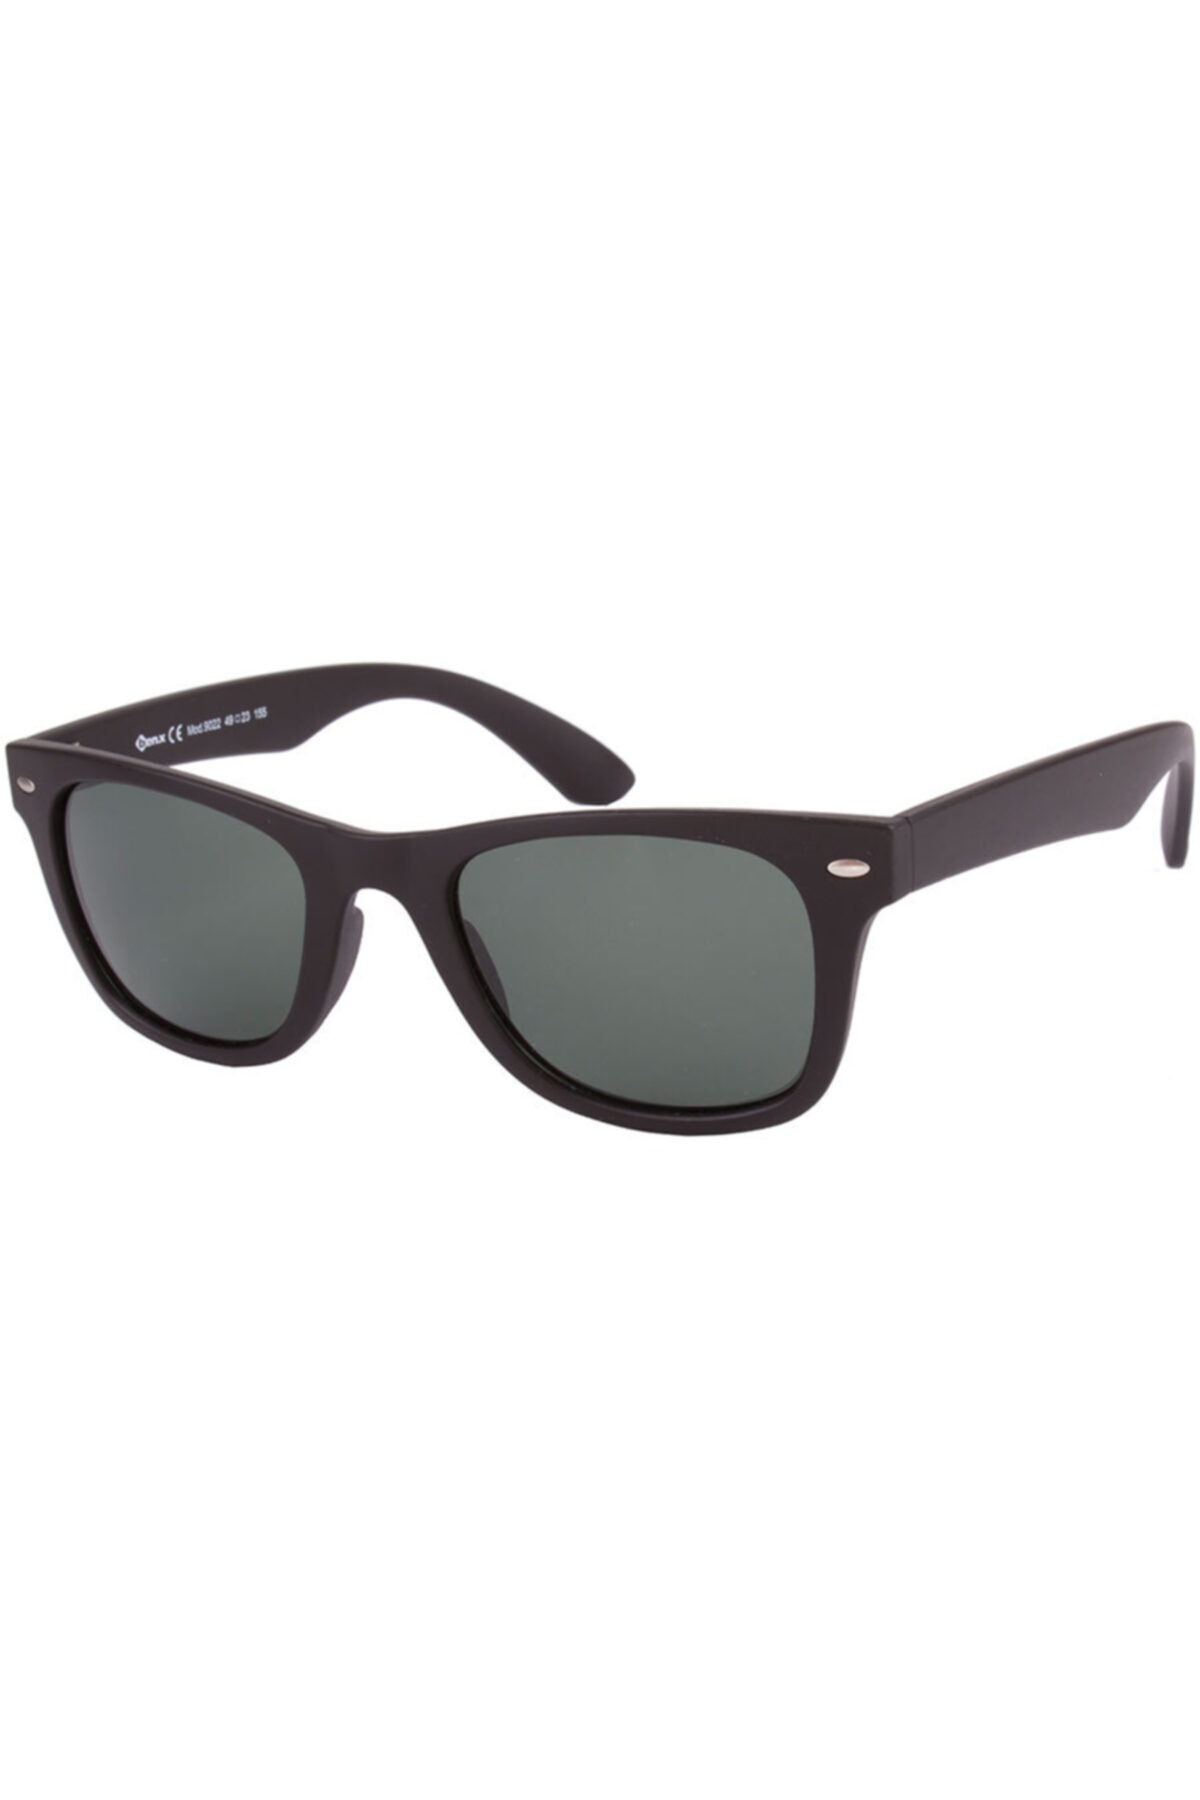 عینک آفتابی زنانه شیک مجلسی برند BEN.X رنگ مشکی کد ty86119861